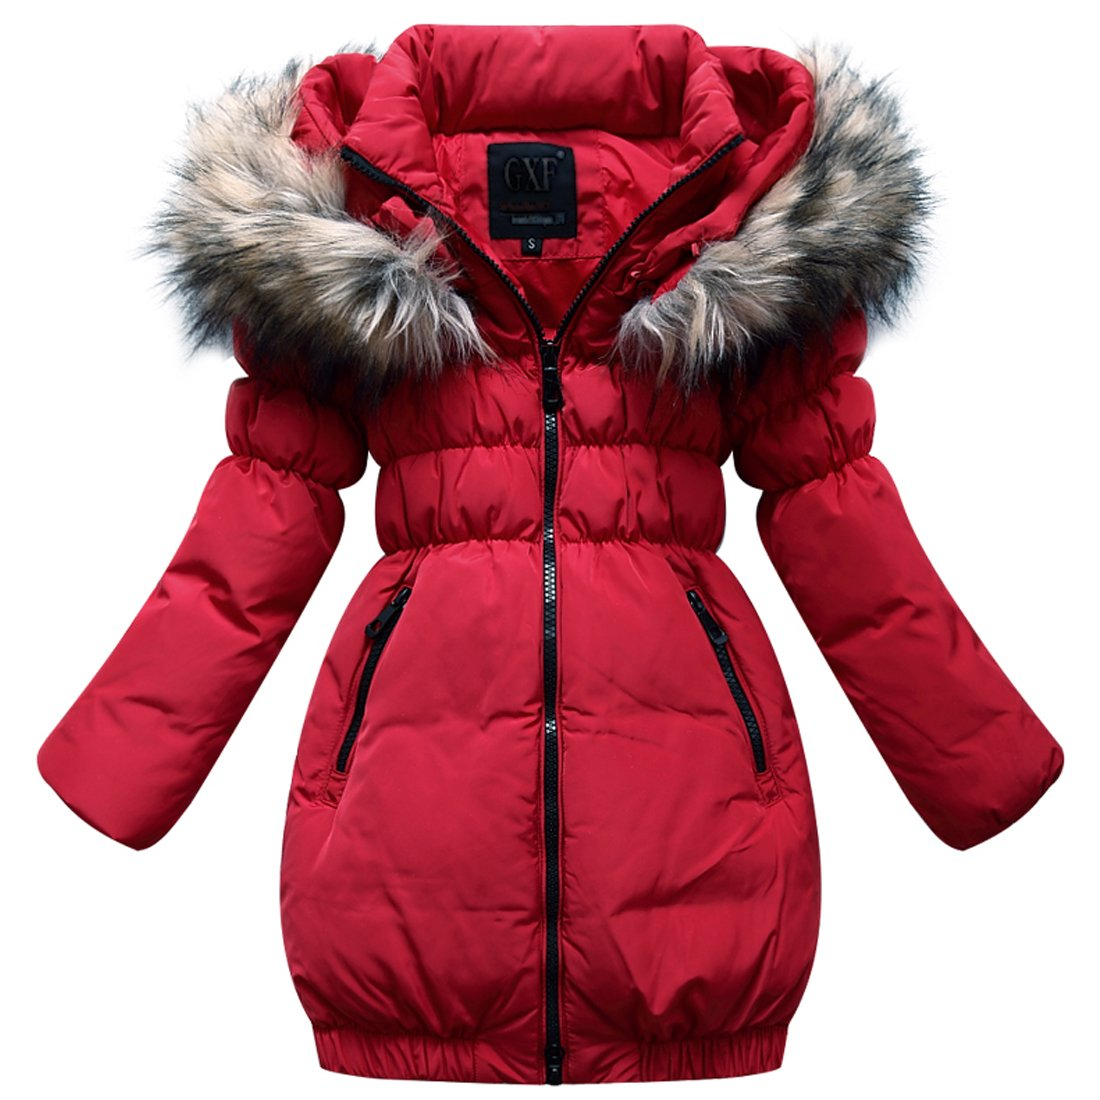 MISSMAY Kids Girls' Down Puffer Jacket Parka Coat Hood Fur Outwear XXL Red